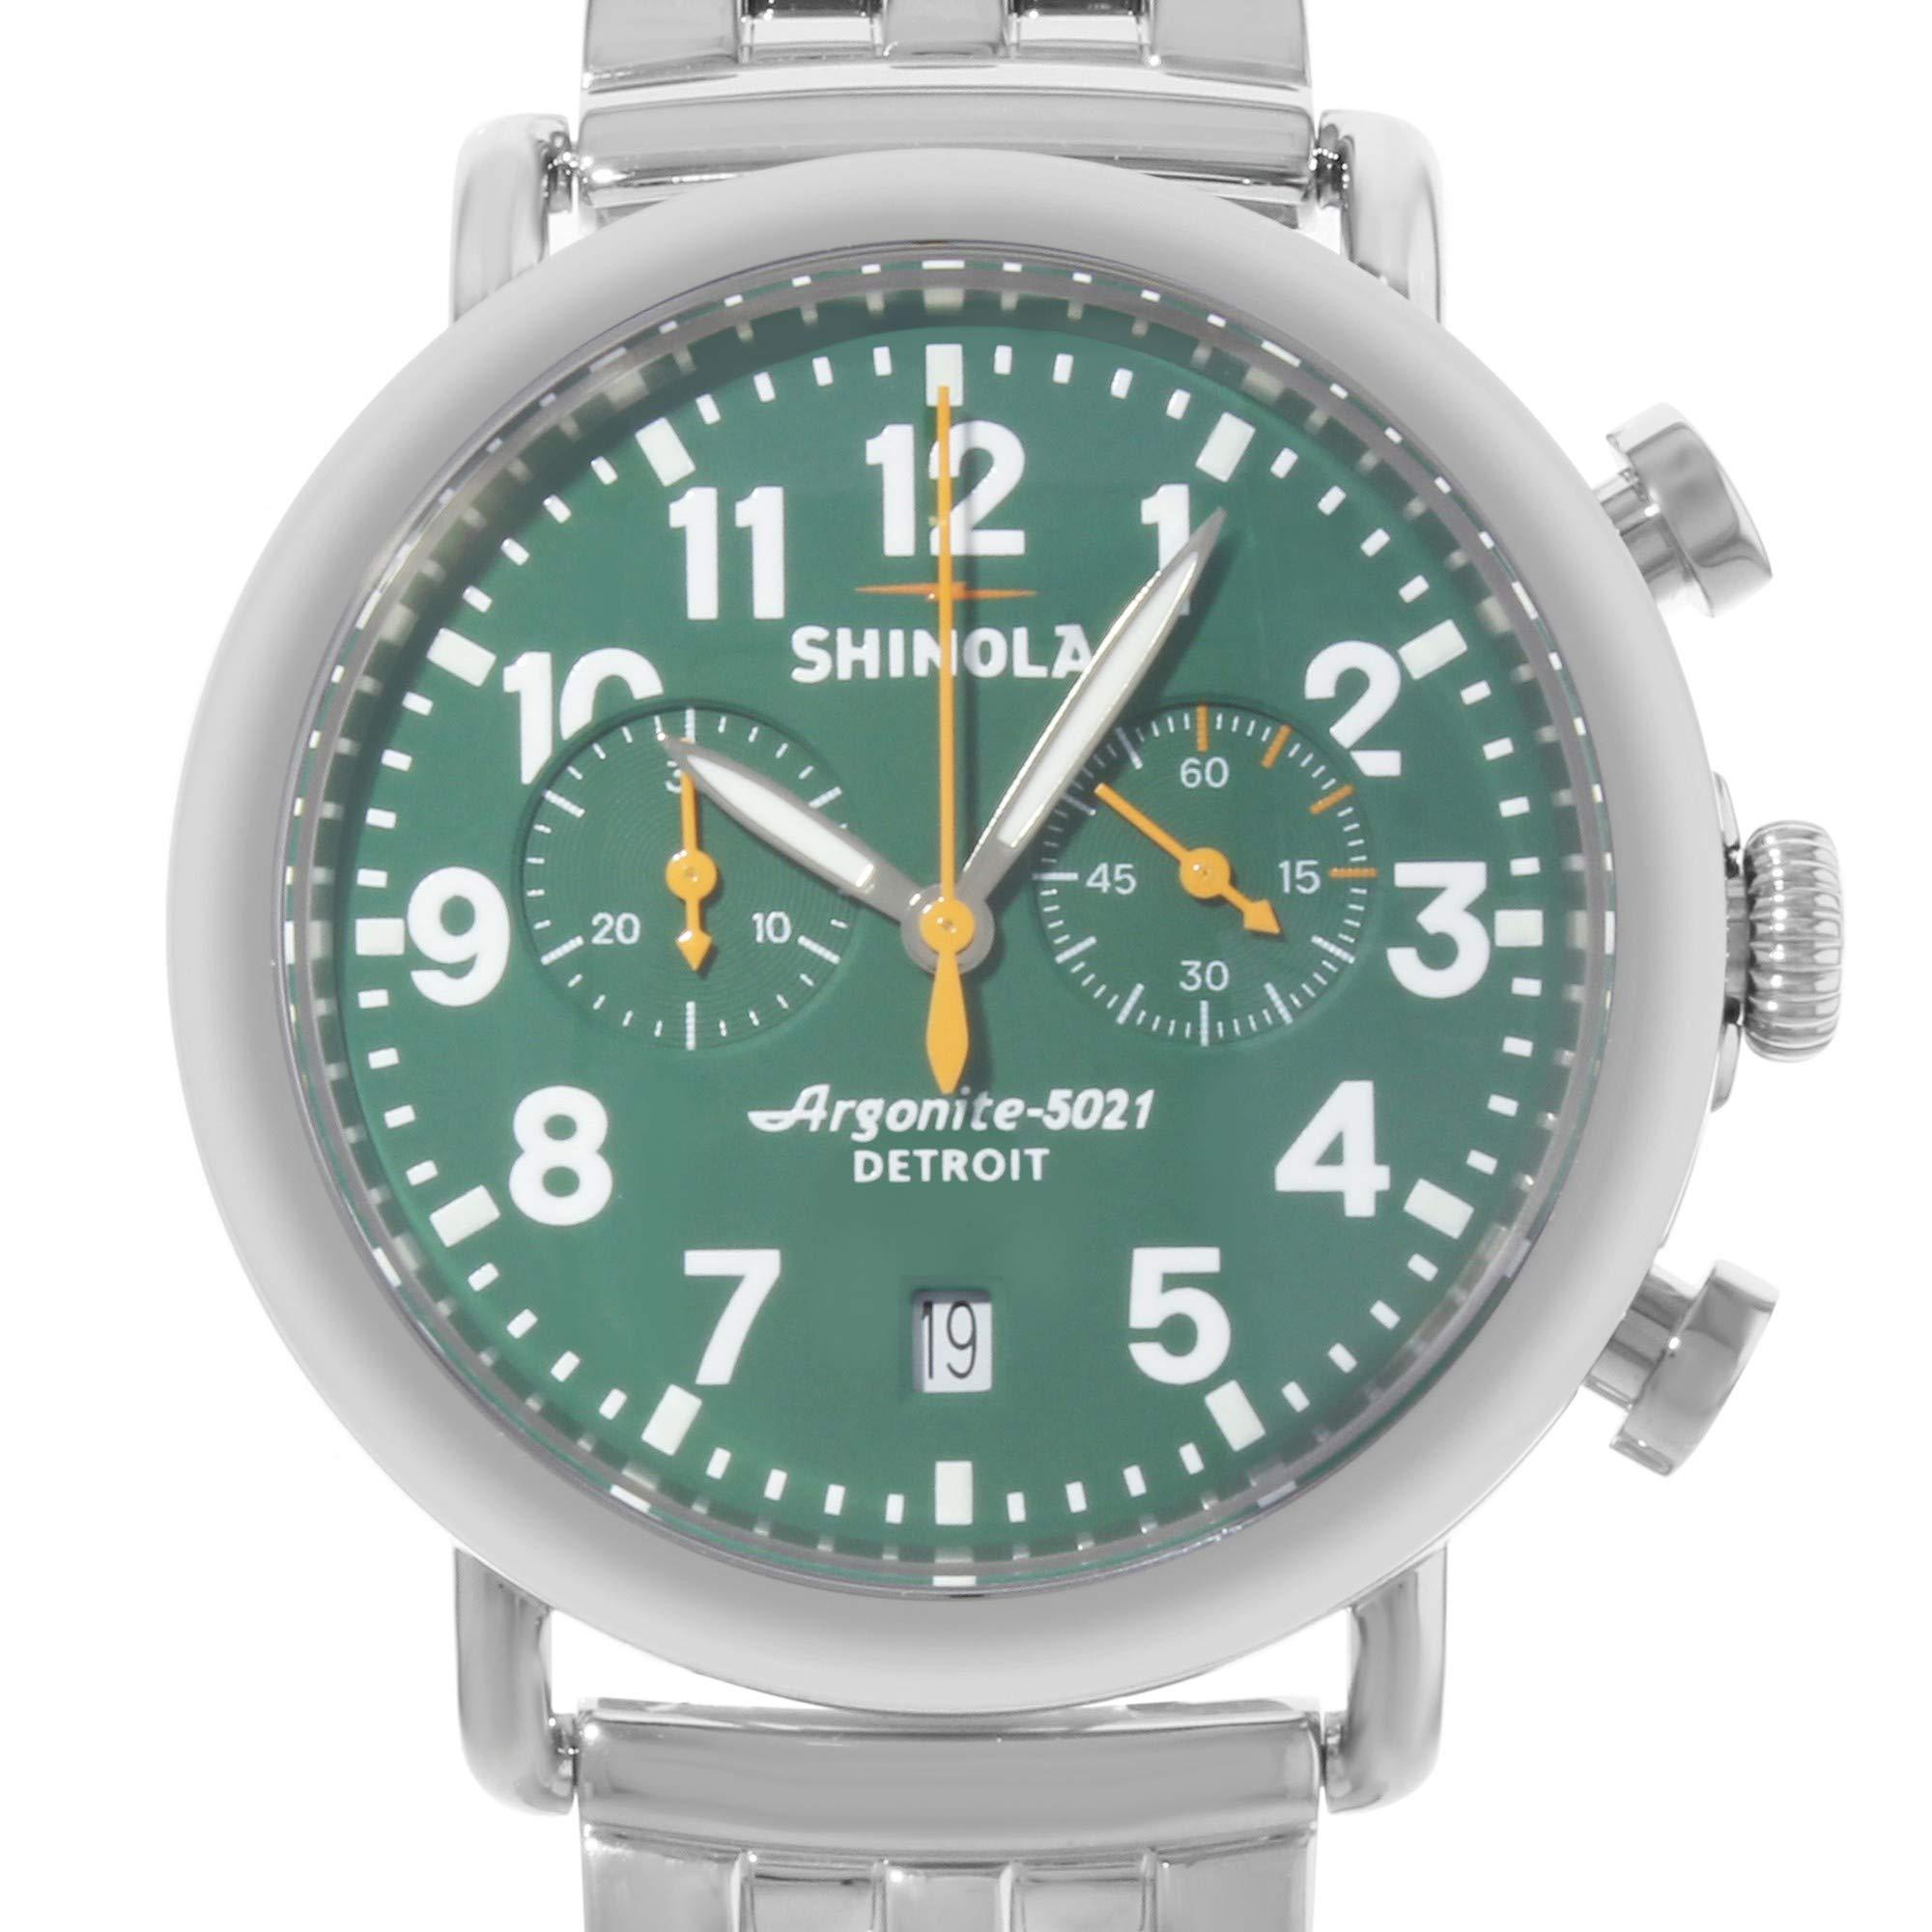 Shinola The Runwell Quartz Male Watch 10000063 (Certified Pre-Owned) by Shinola (Image #3)